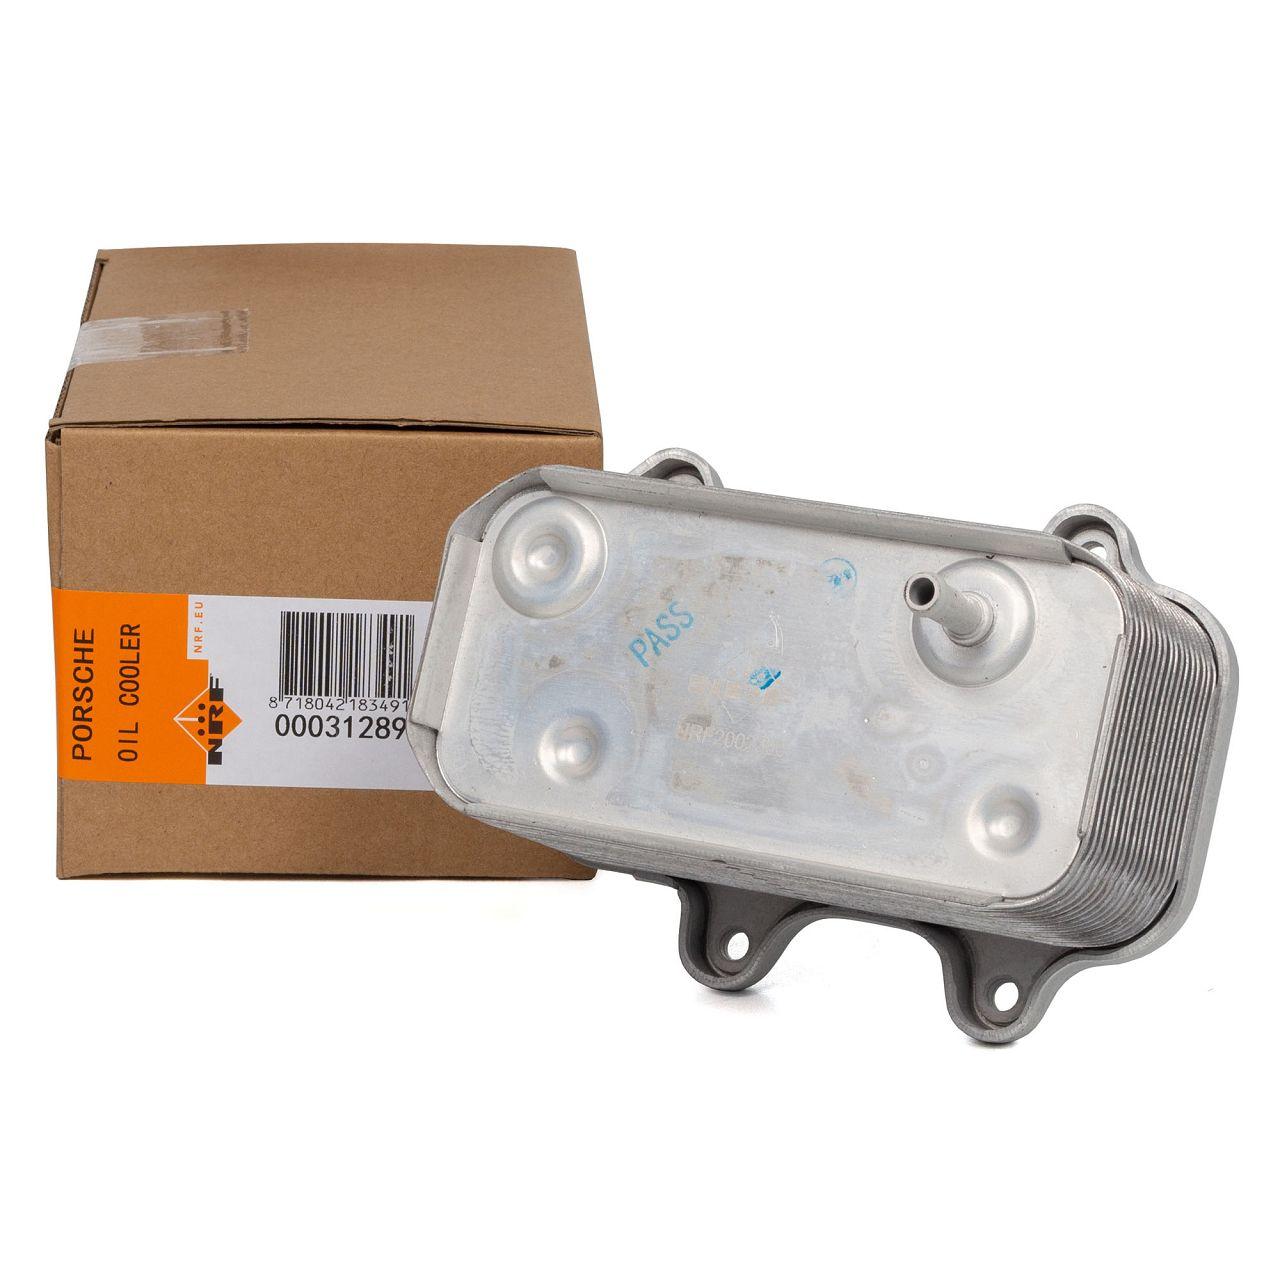 NRF 31289 Ölkühler Motorkühler PORSCHE Boxster 986 2.5 2.7 987 2.7 3.2 99610702507